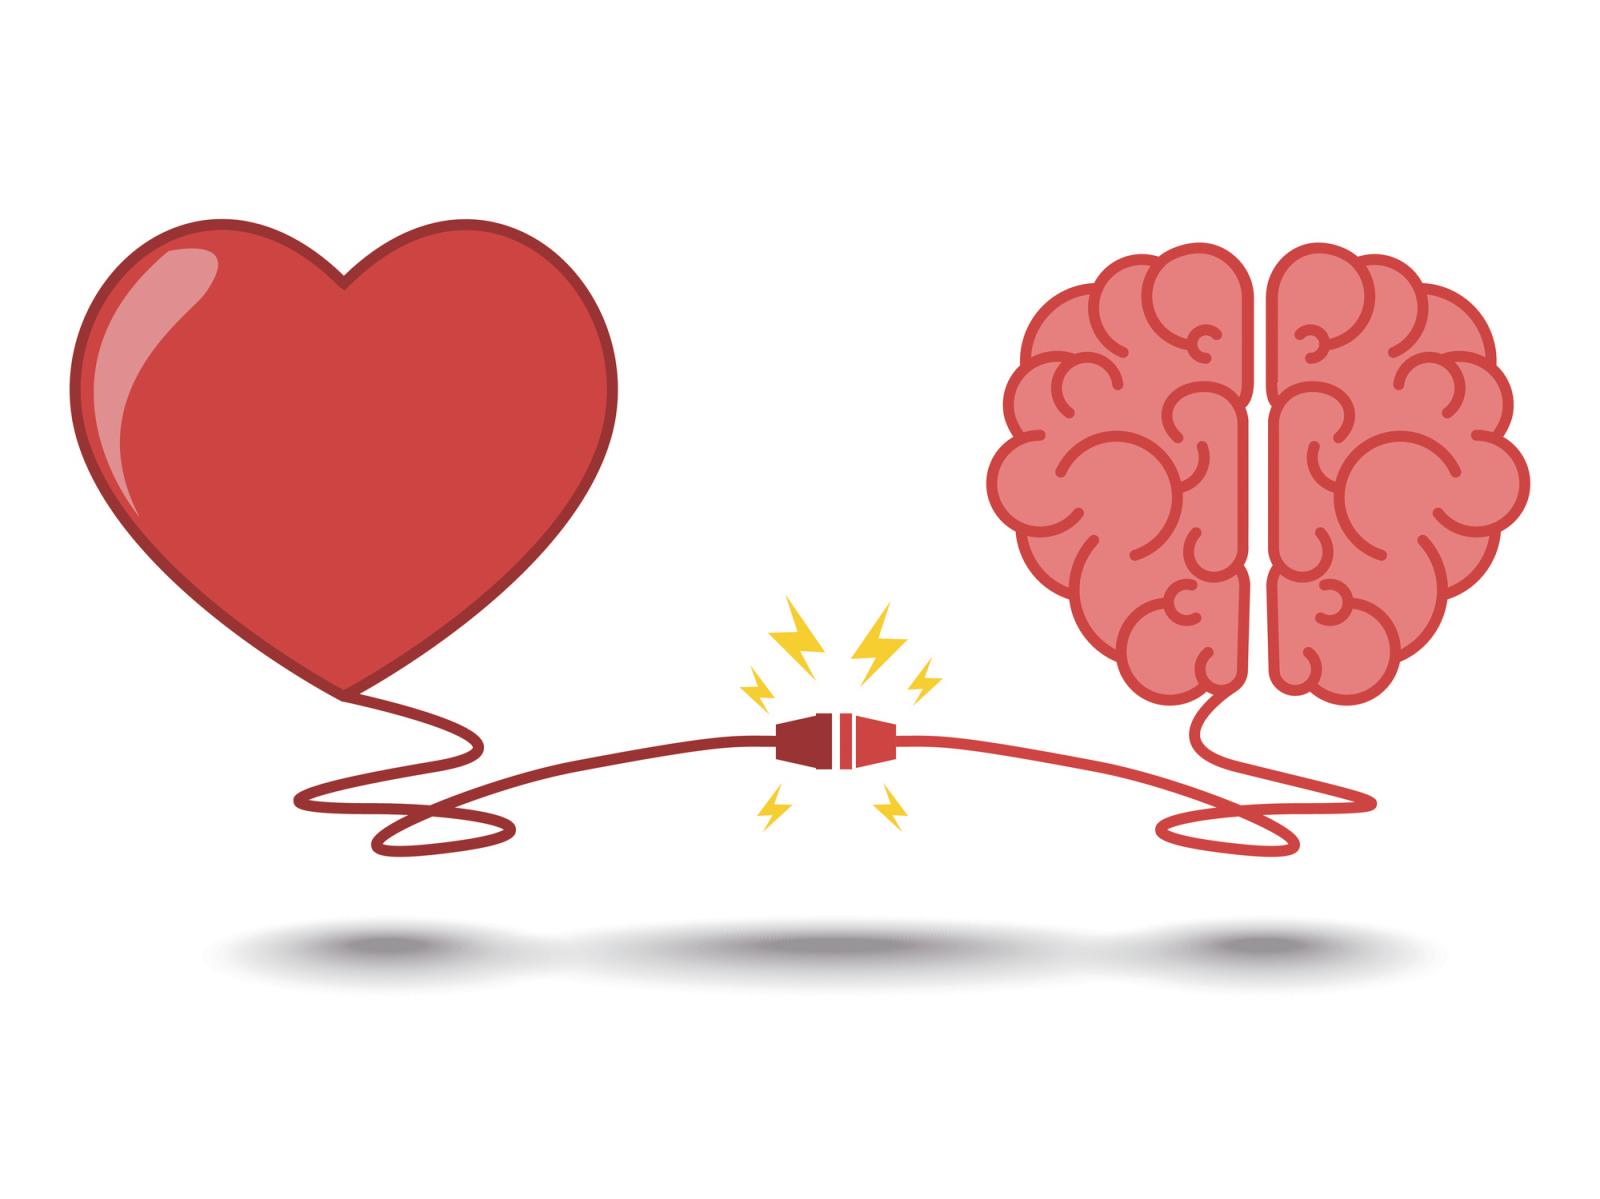 Brains clipart healthy mind Brain health brain at links